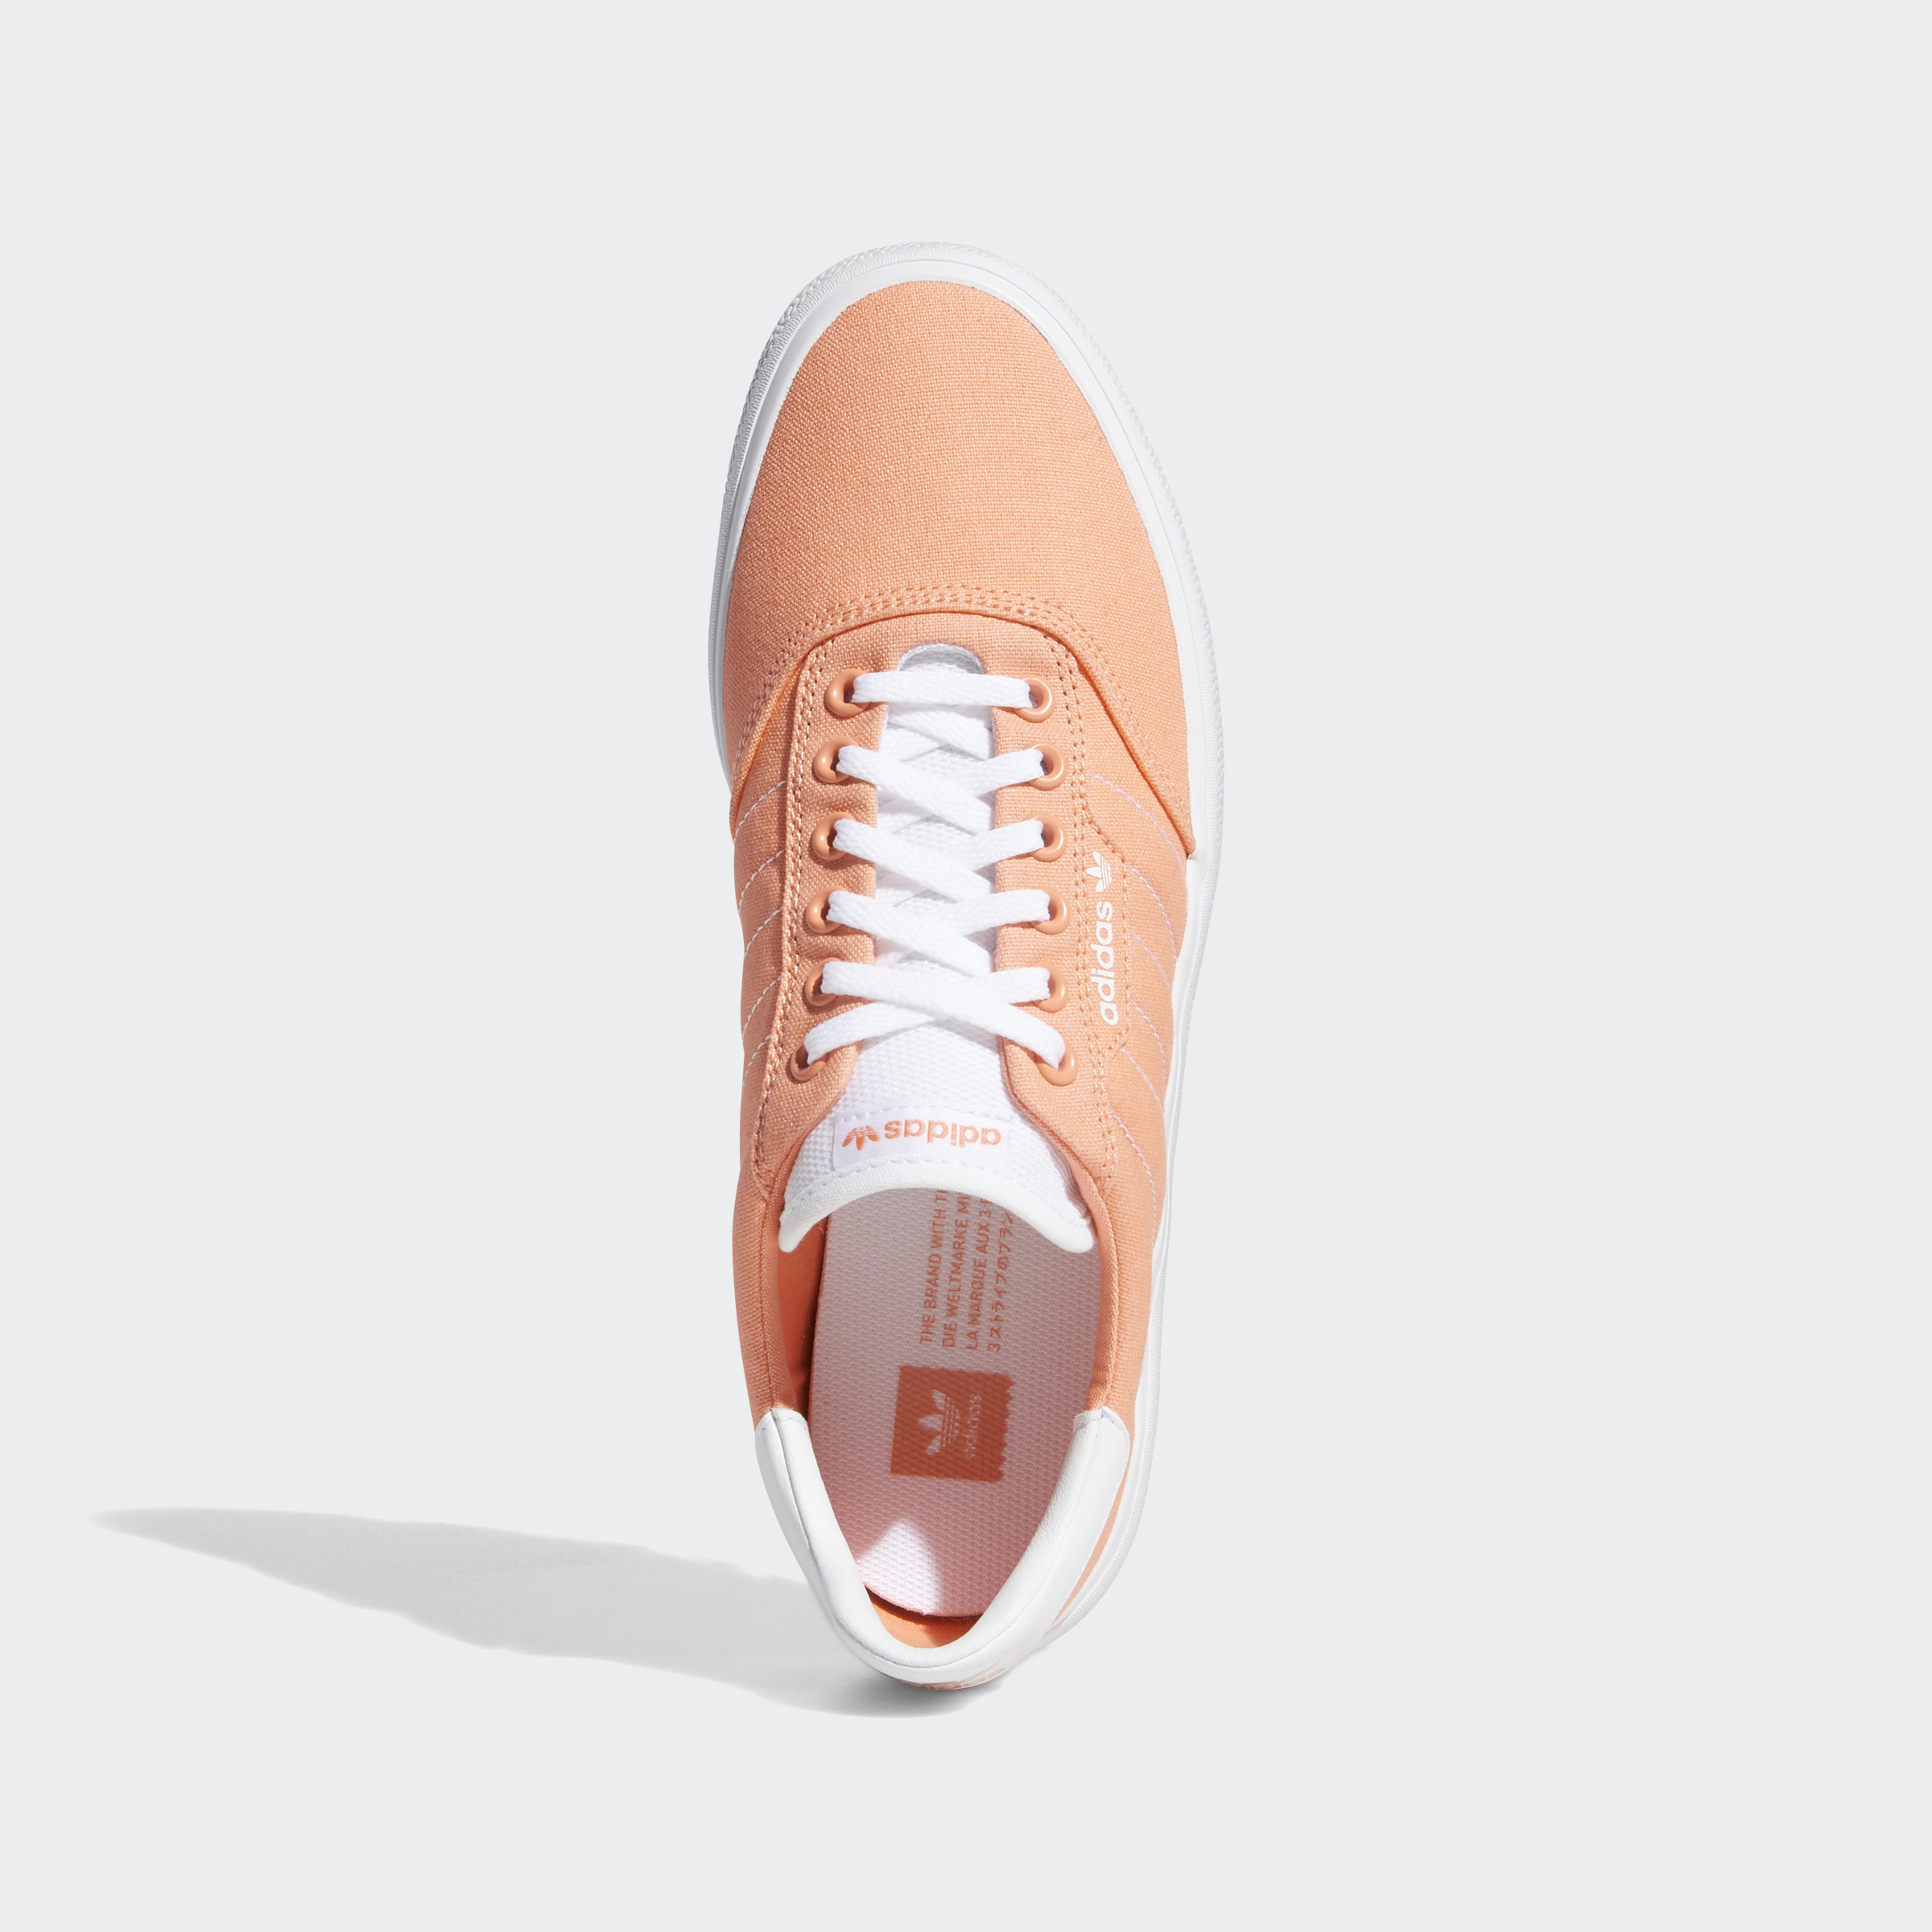 adidas-3MC-Shoes-Athletic-amp-Sneakers thumbnail 20